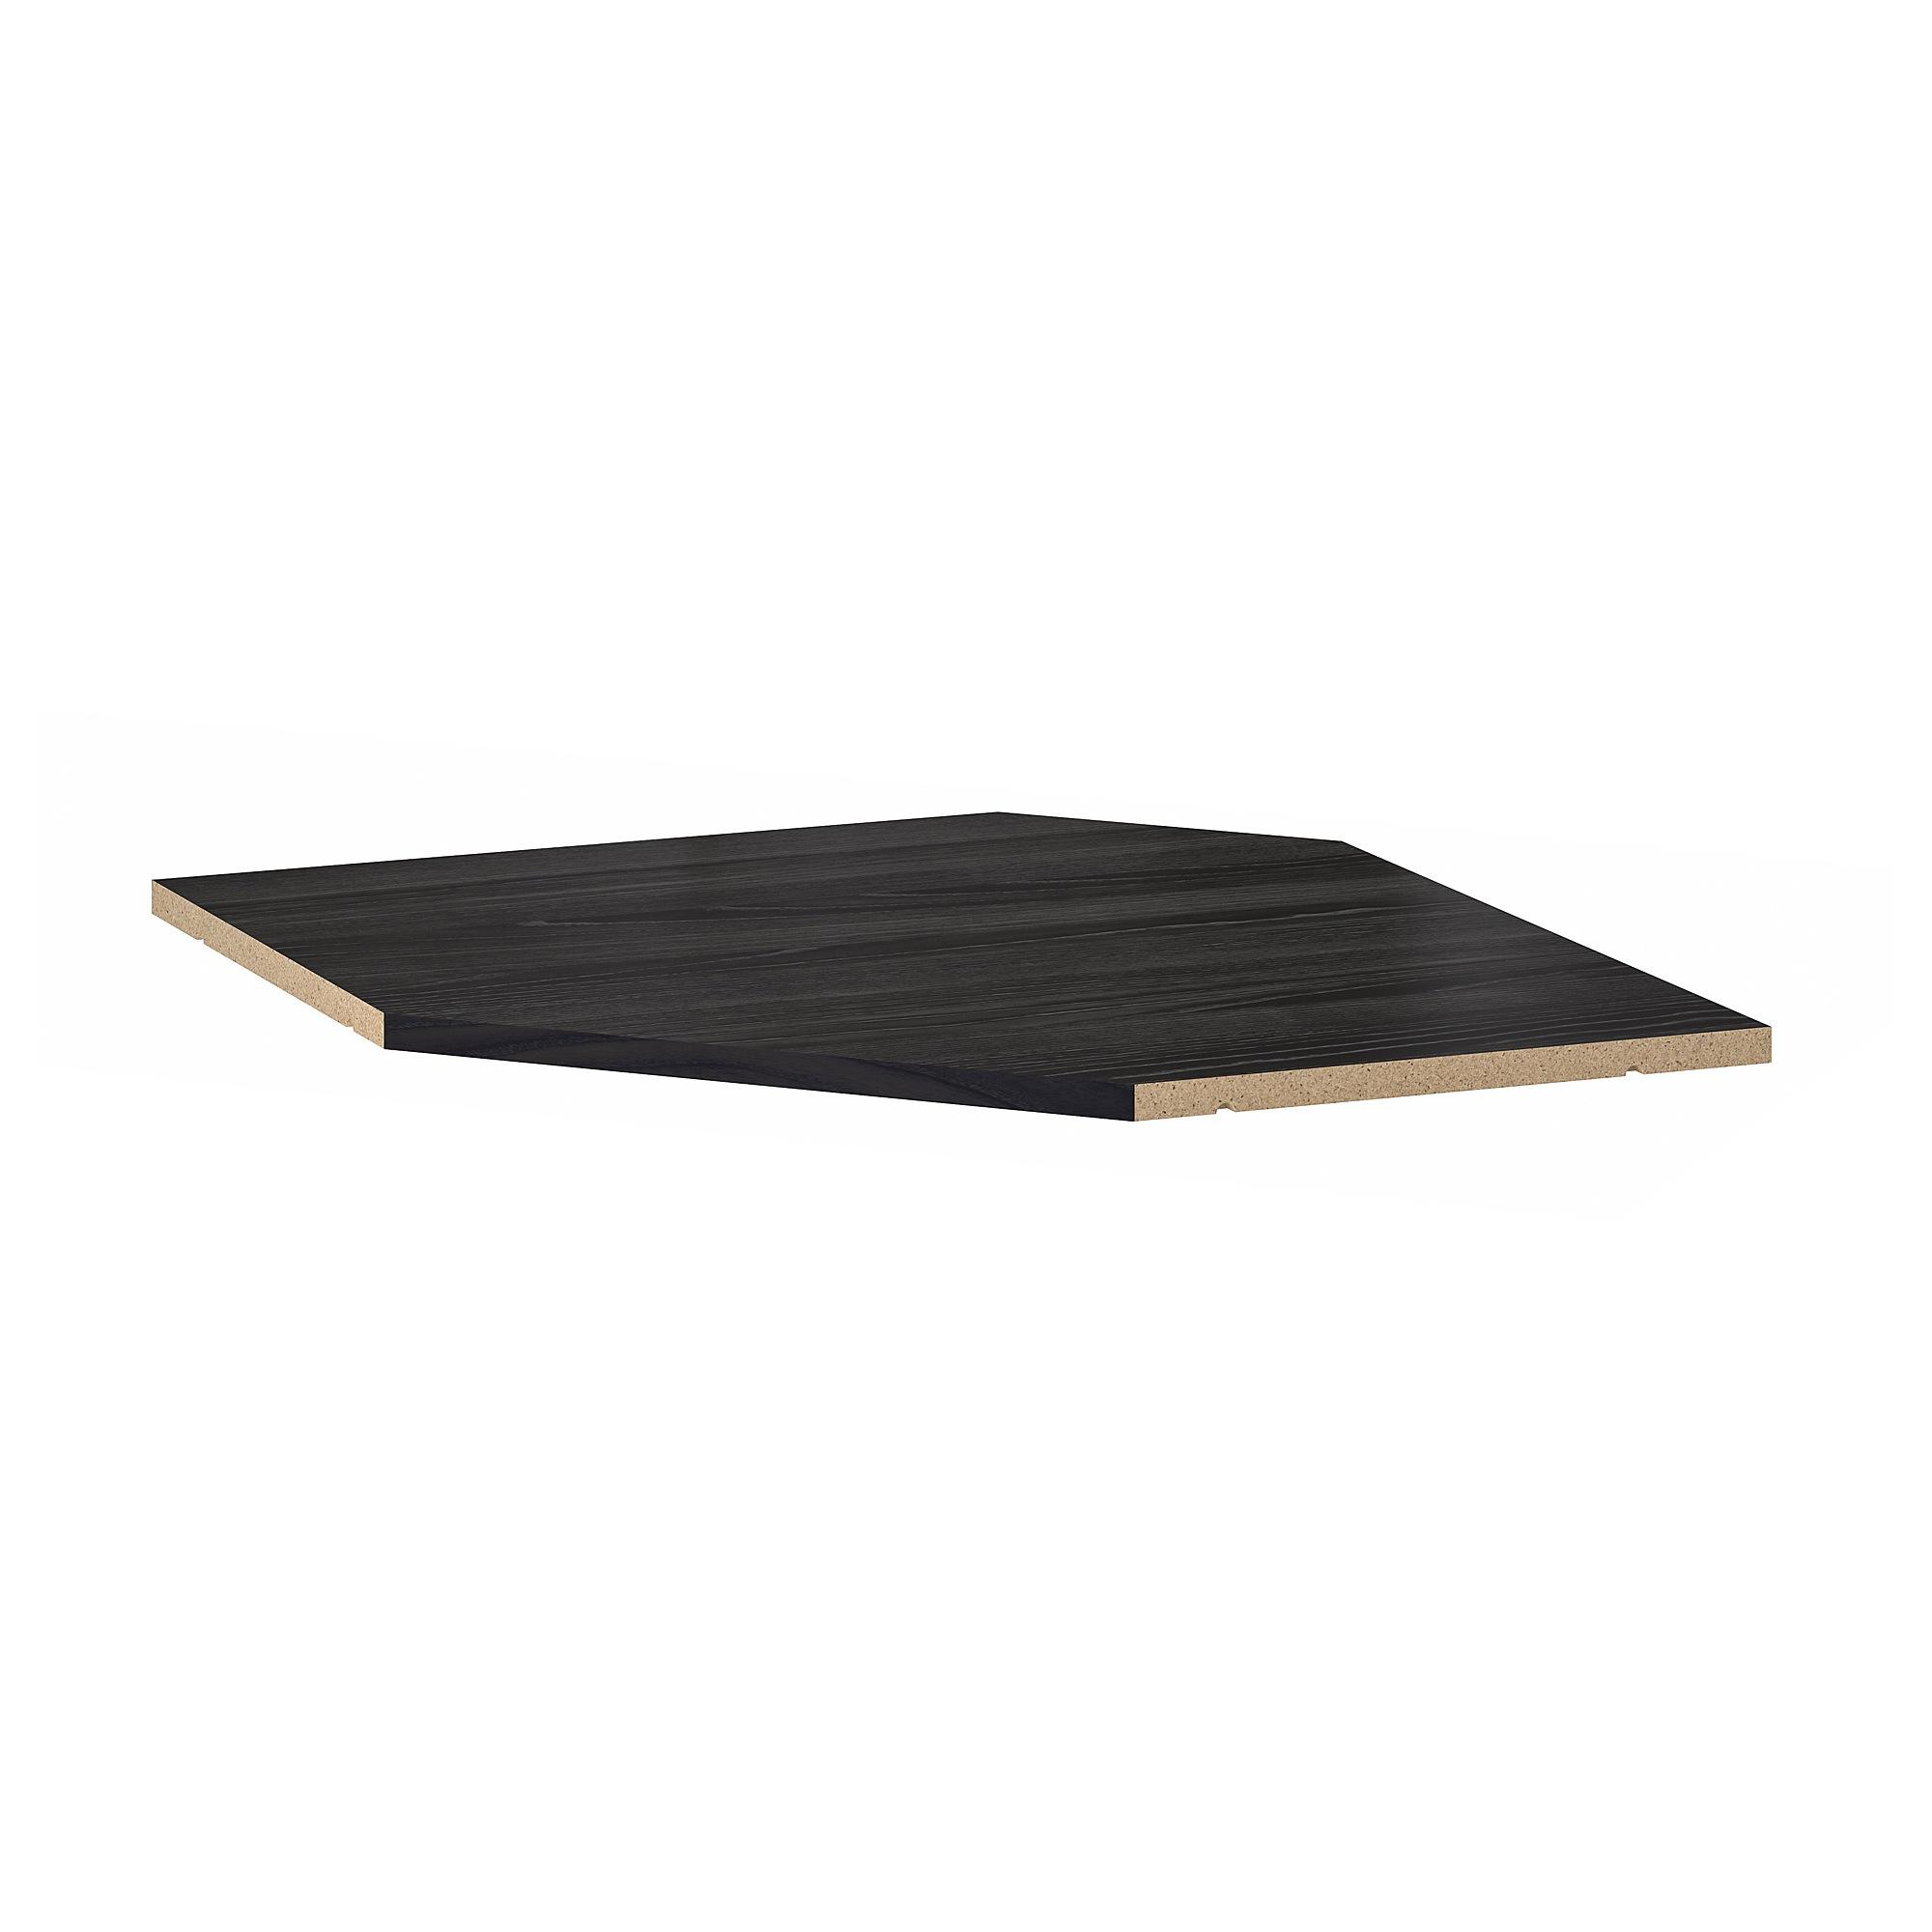 utrusta tablette element mural d angle effet bois noir 68 cm